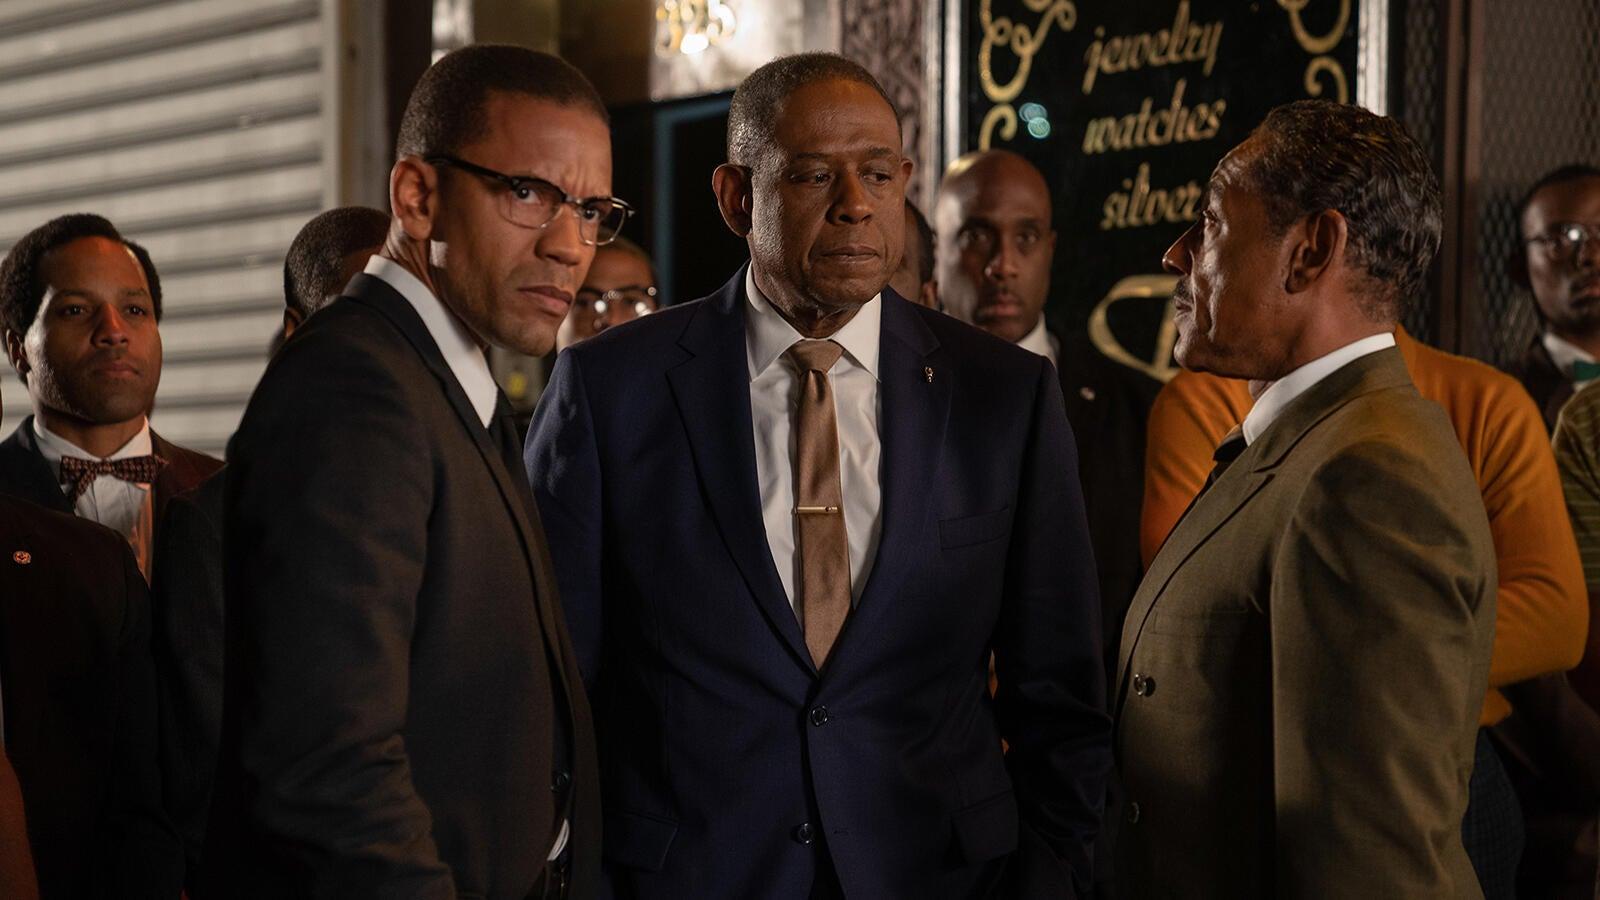 Nigel Thatch, Forest Whitaker, Giancarlo Esposito, Godfather of Harlem